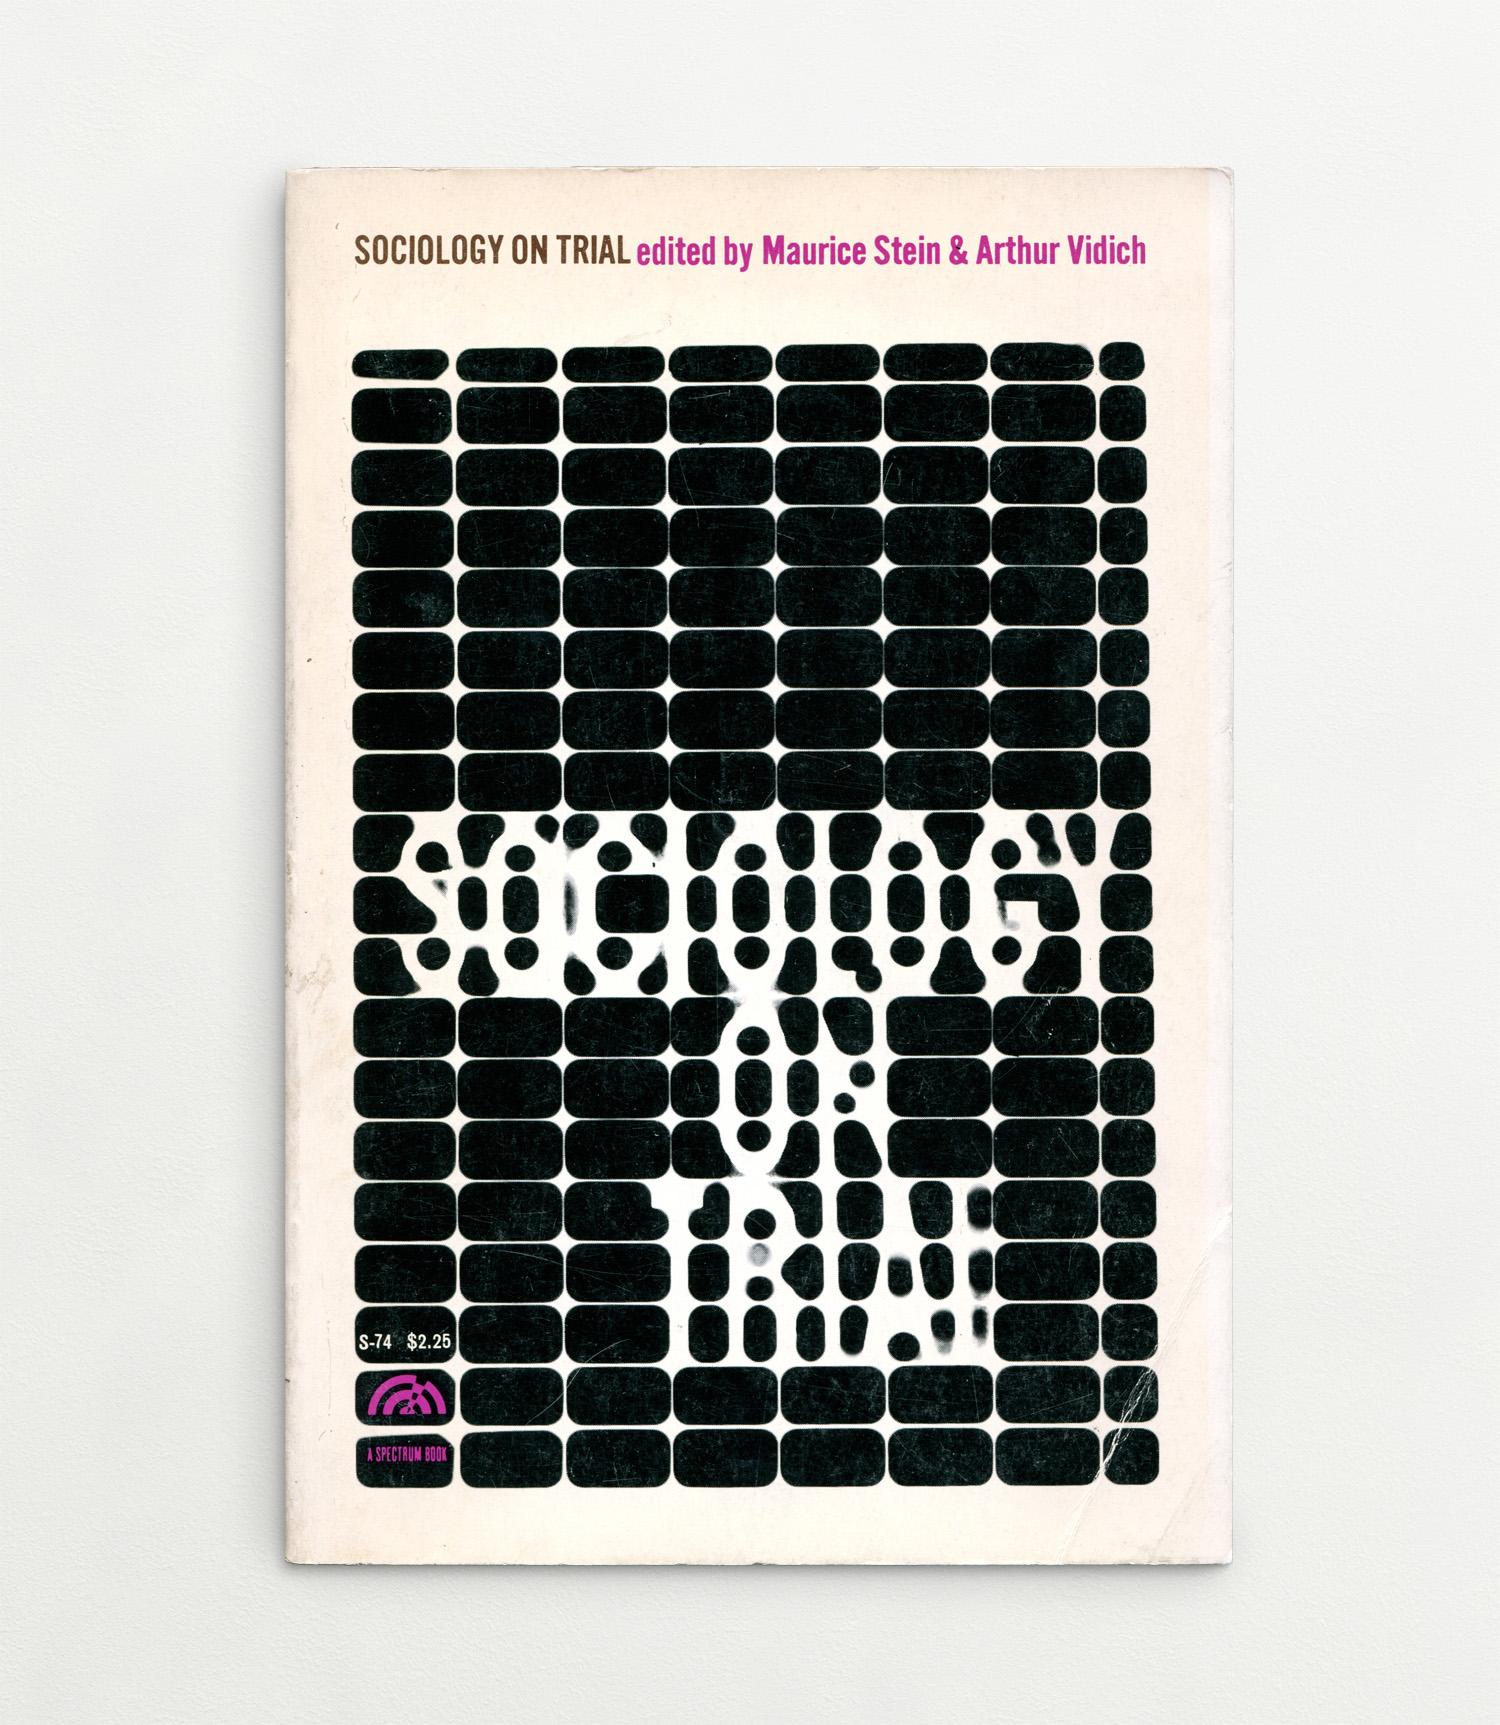 sociologyontrial.jpg